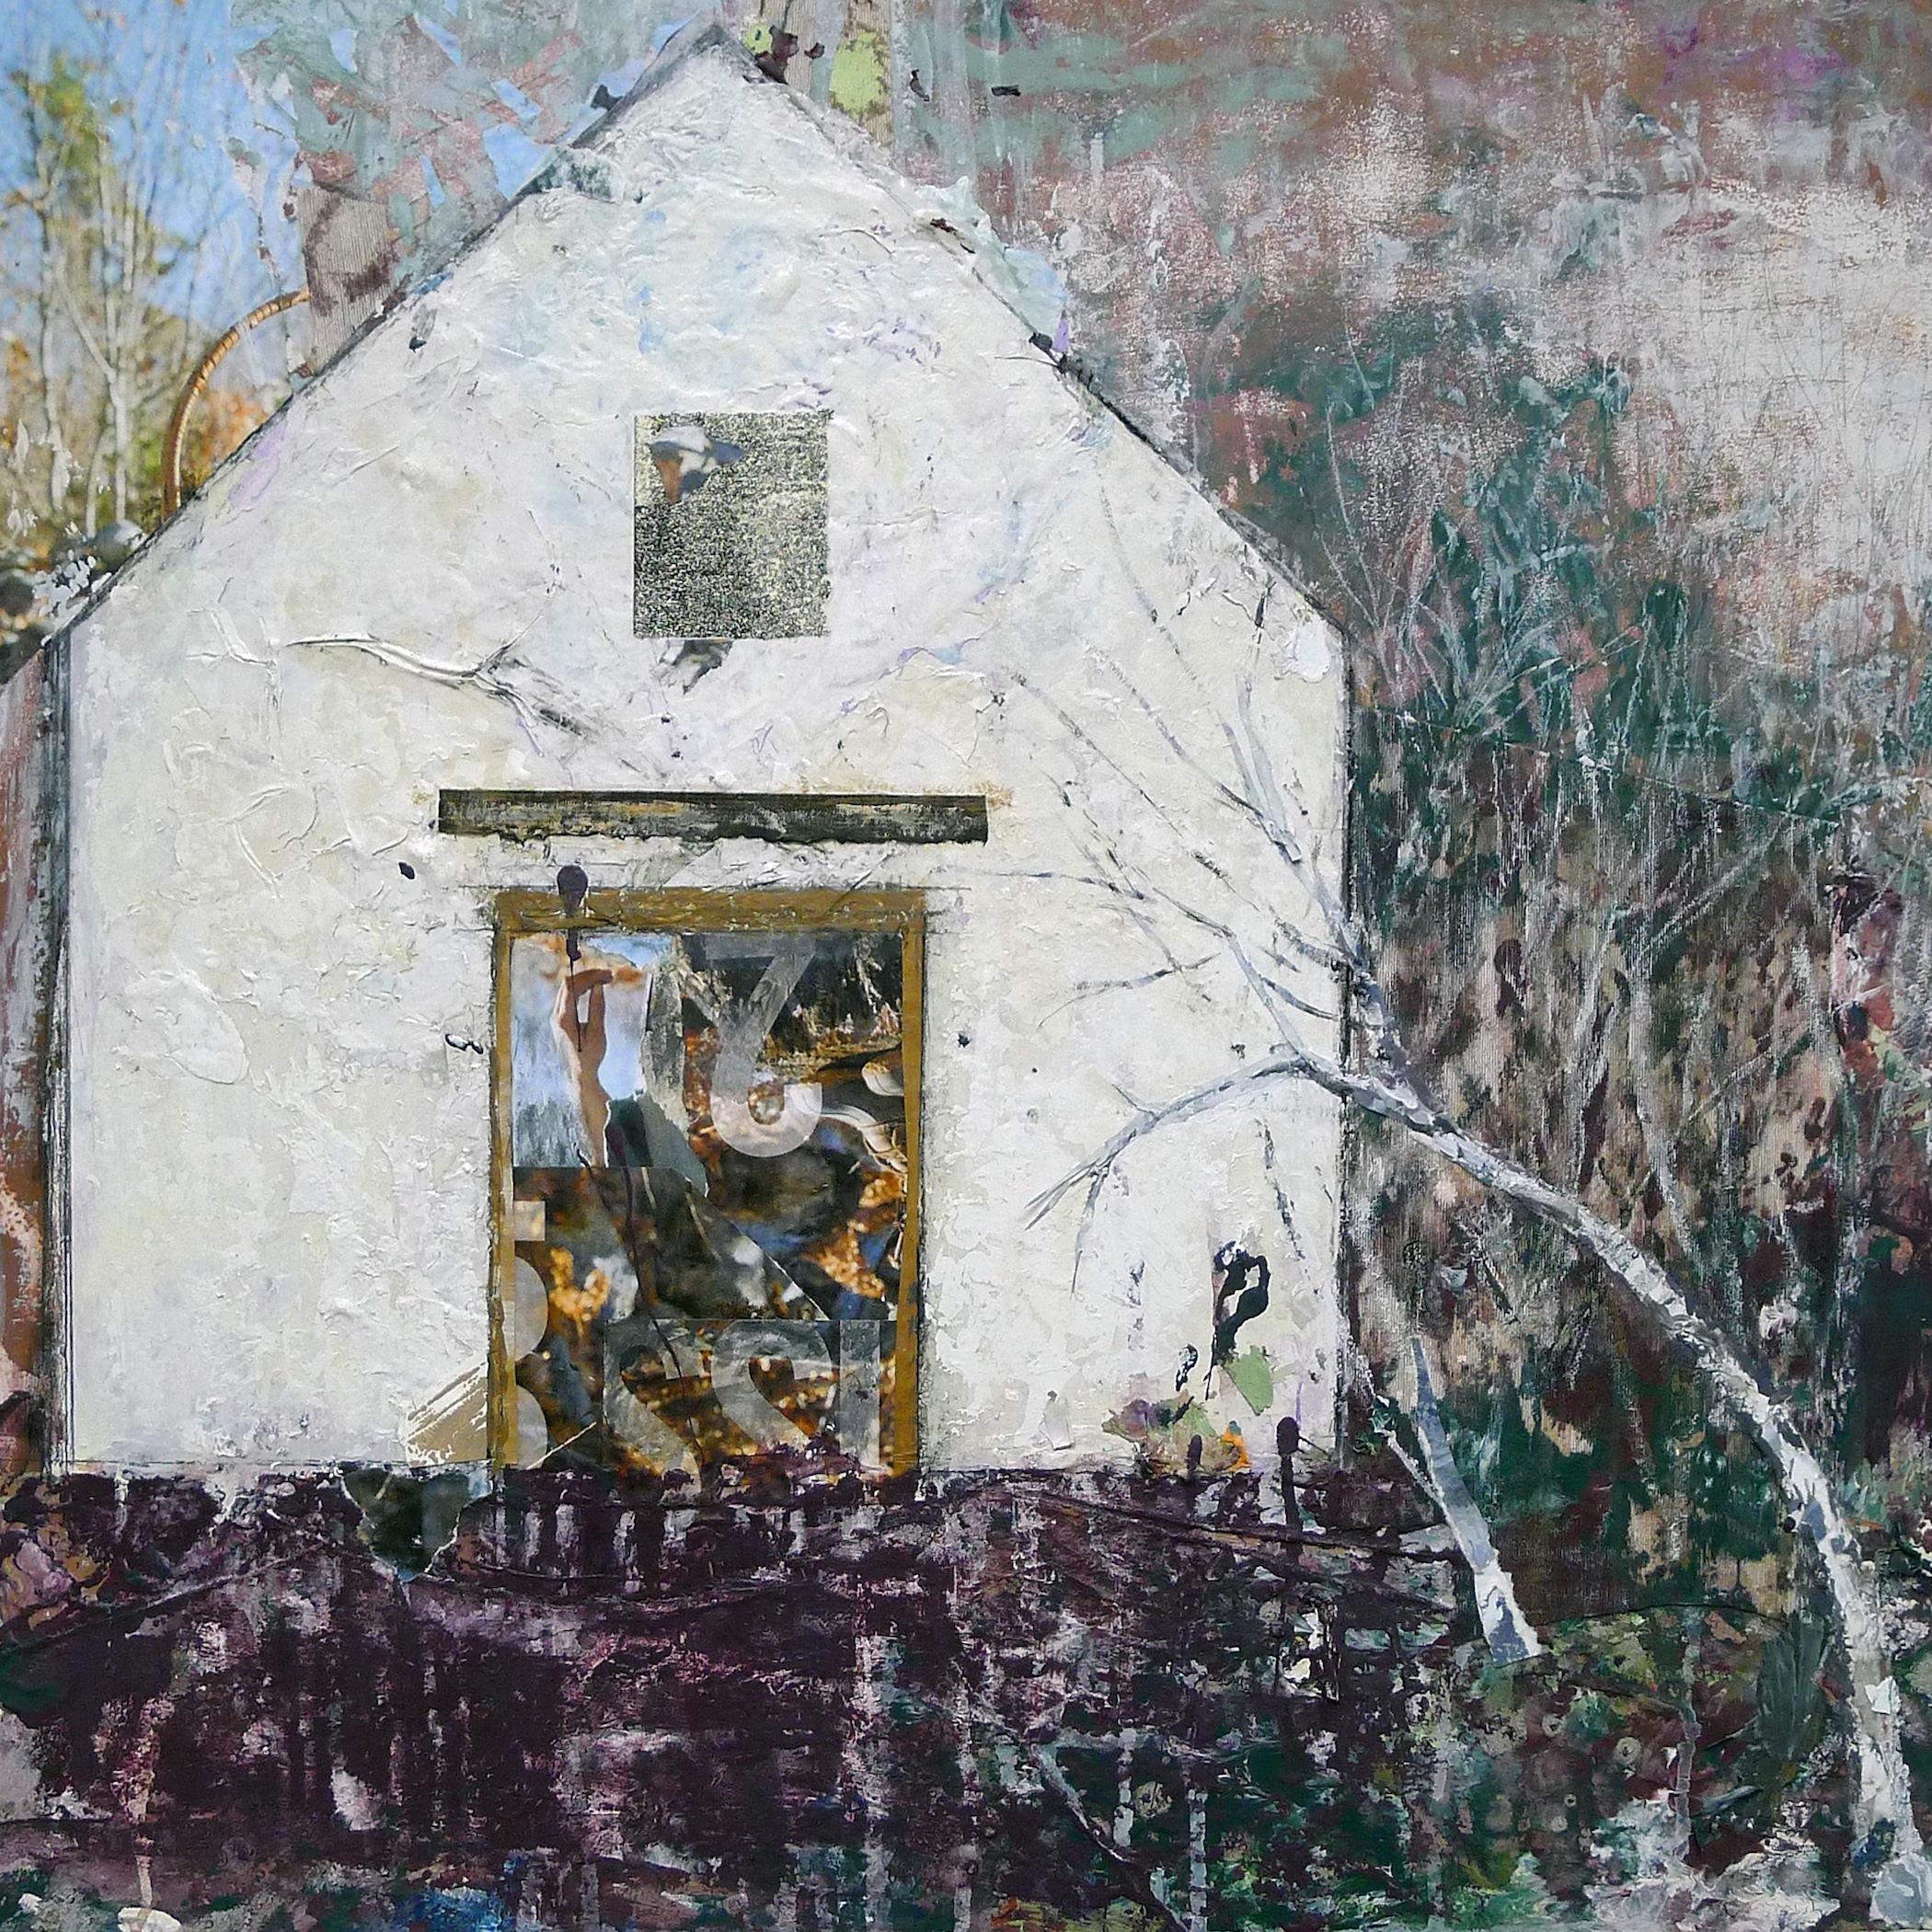 Brenda Cirioni,  Barn Series: Due Course, Mixed media painting, 24x24